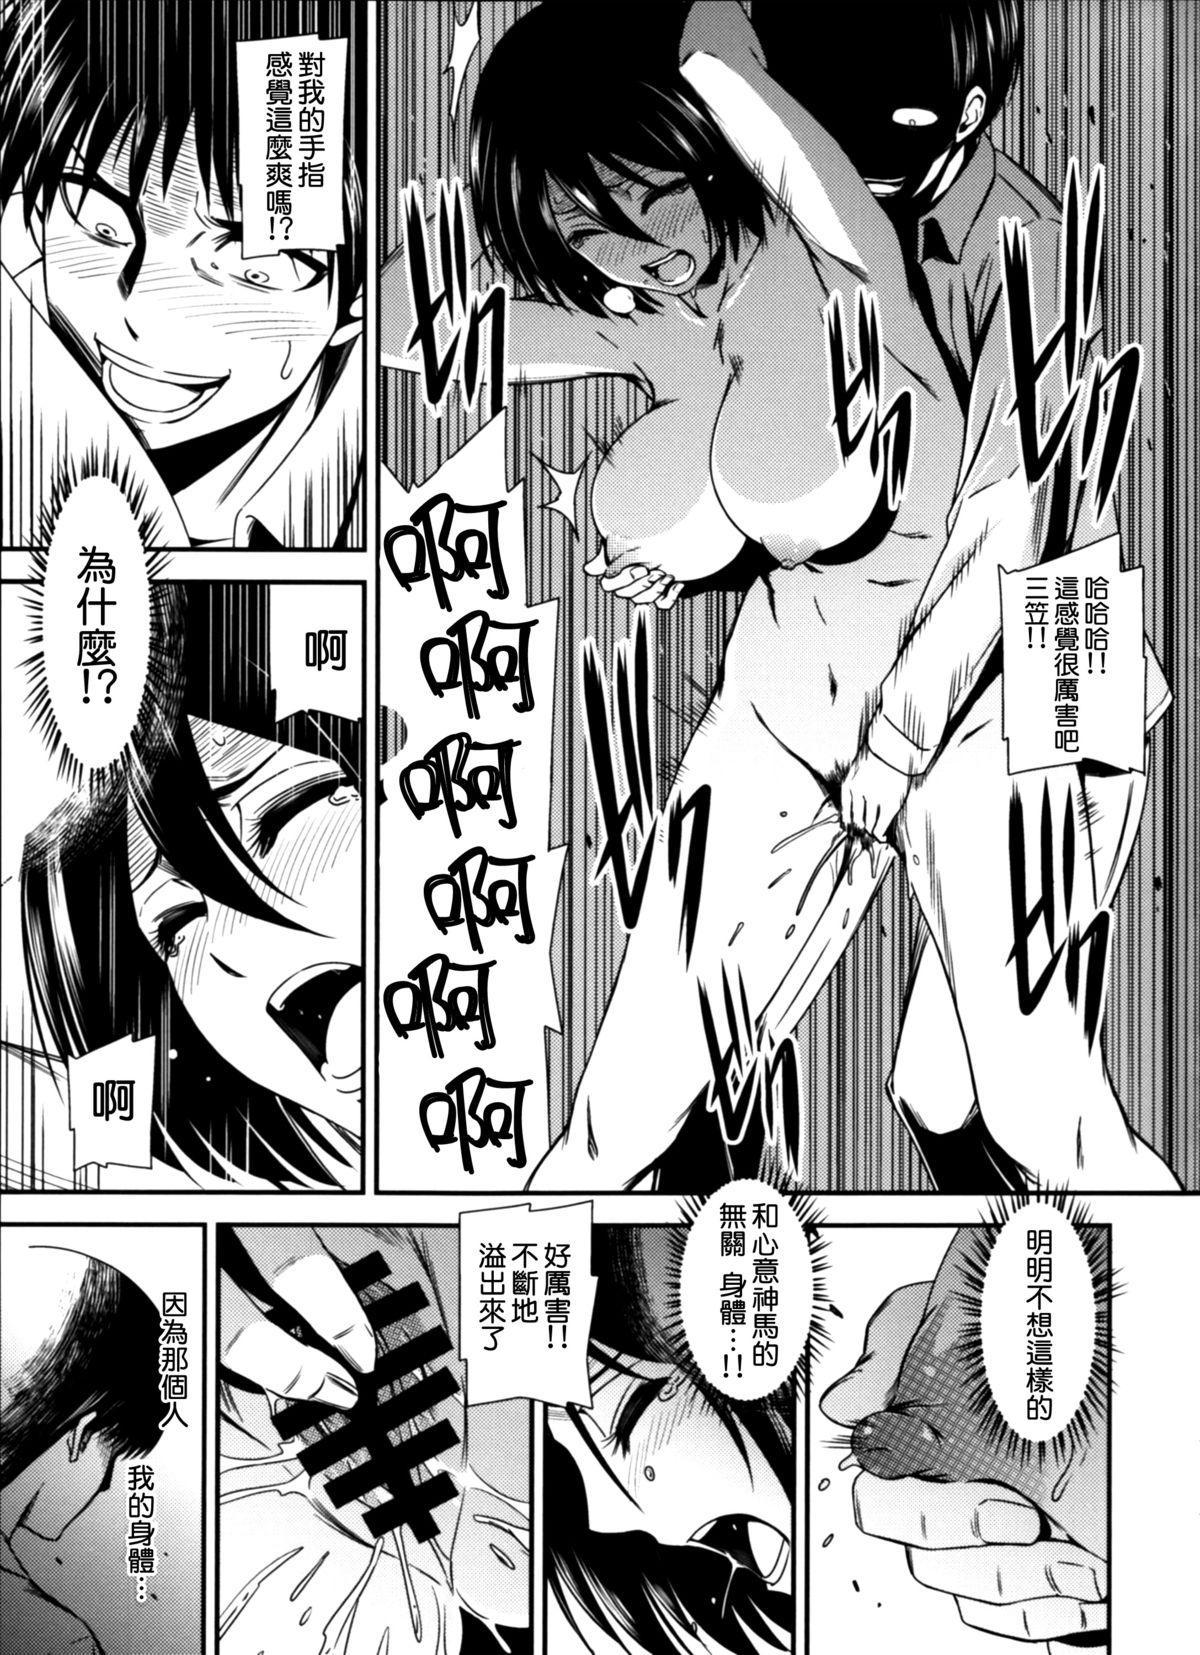 Gekishin Yon 17